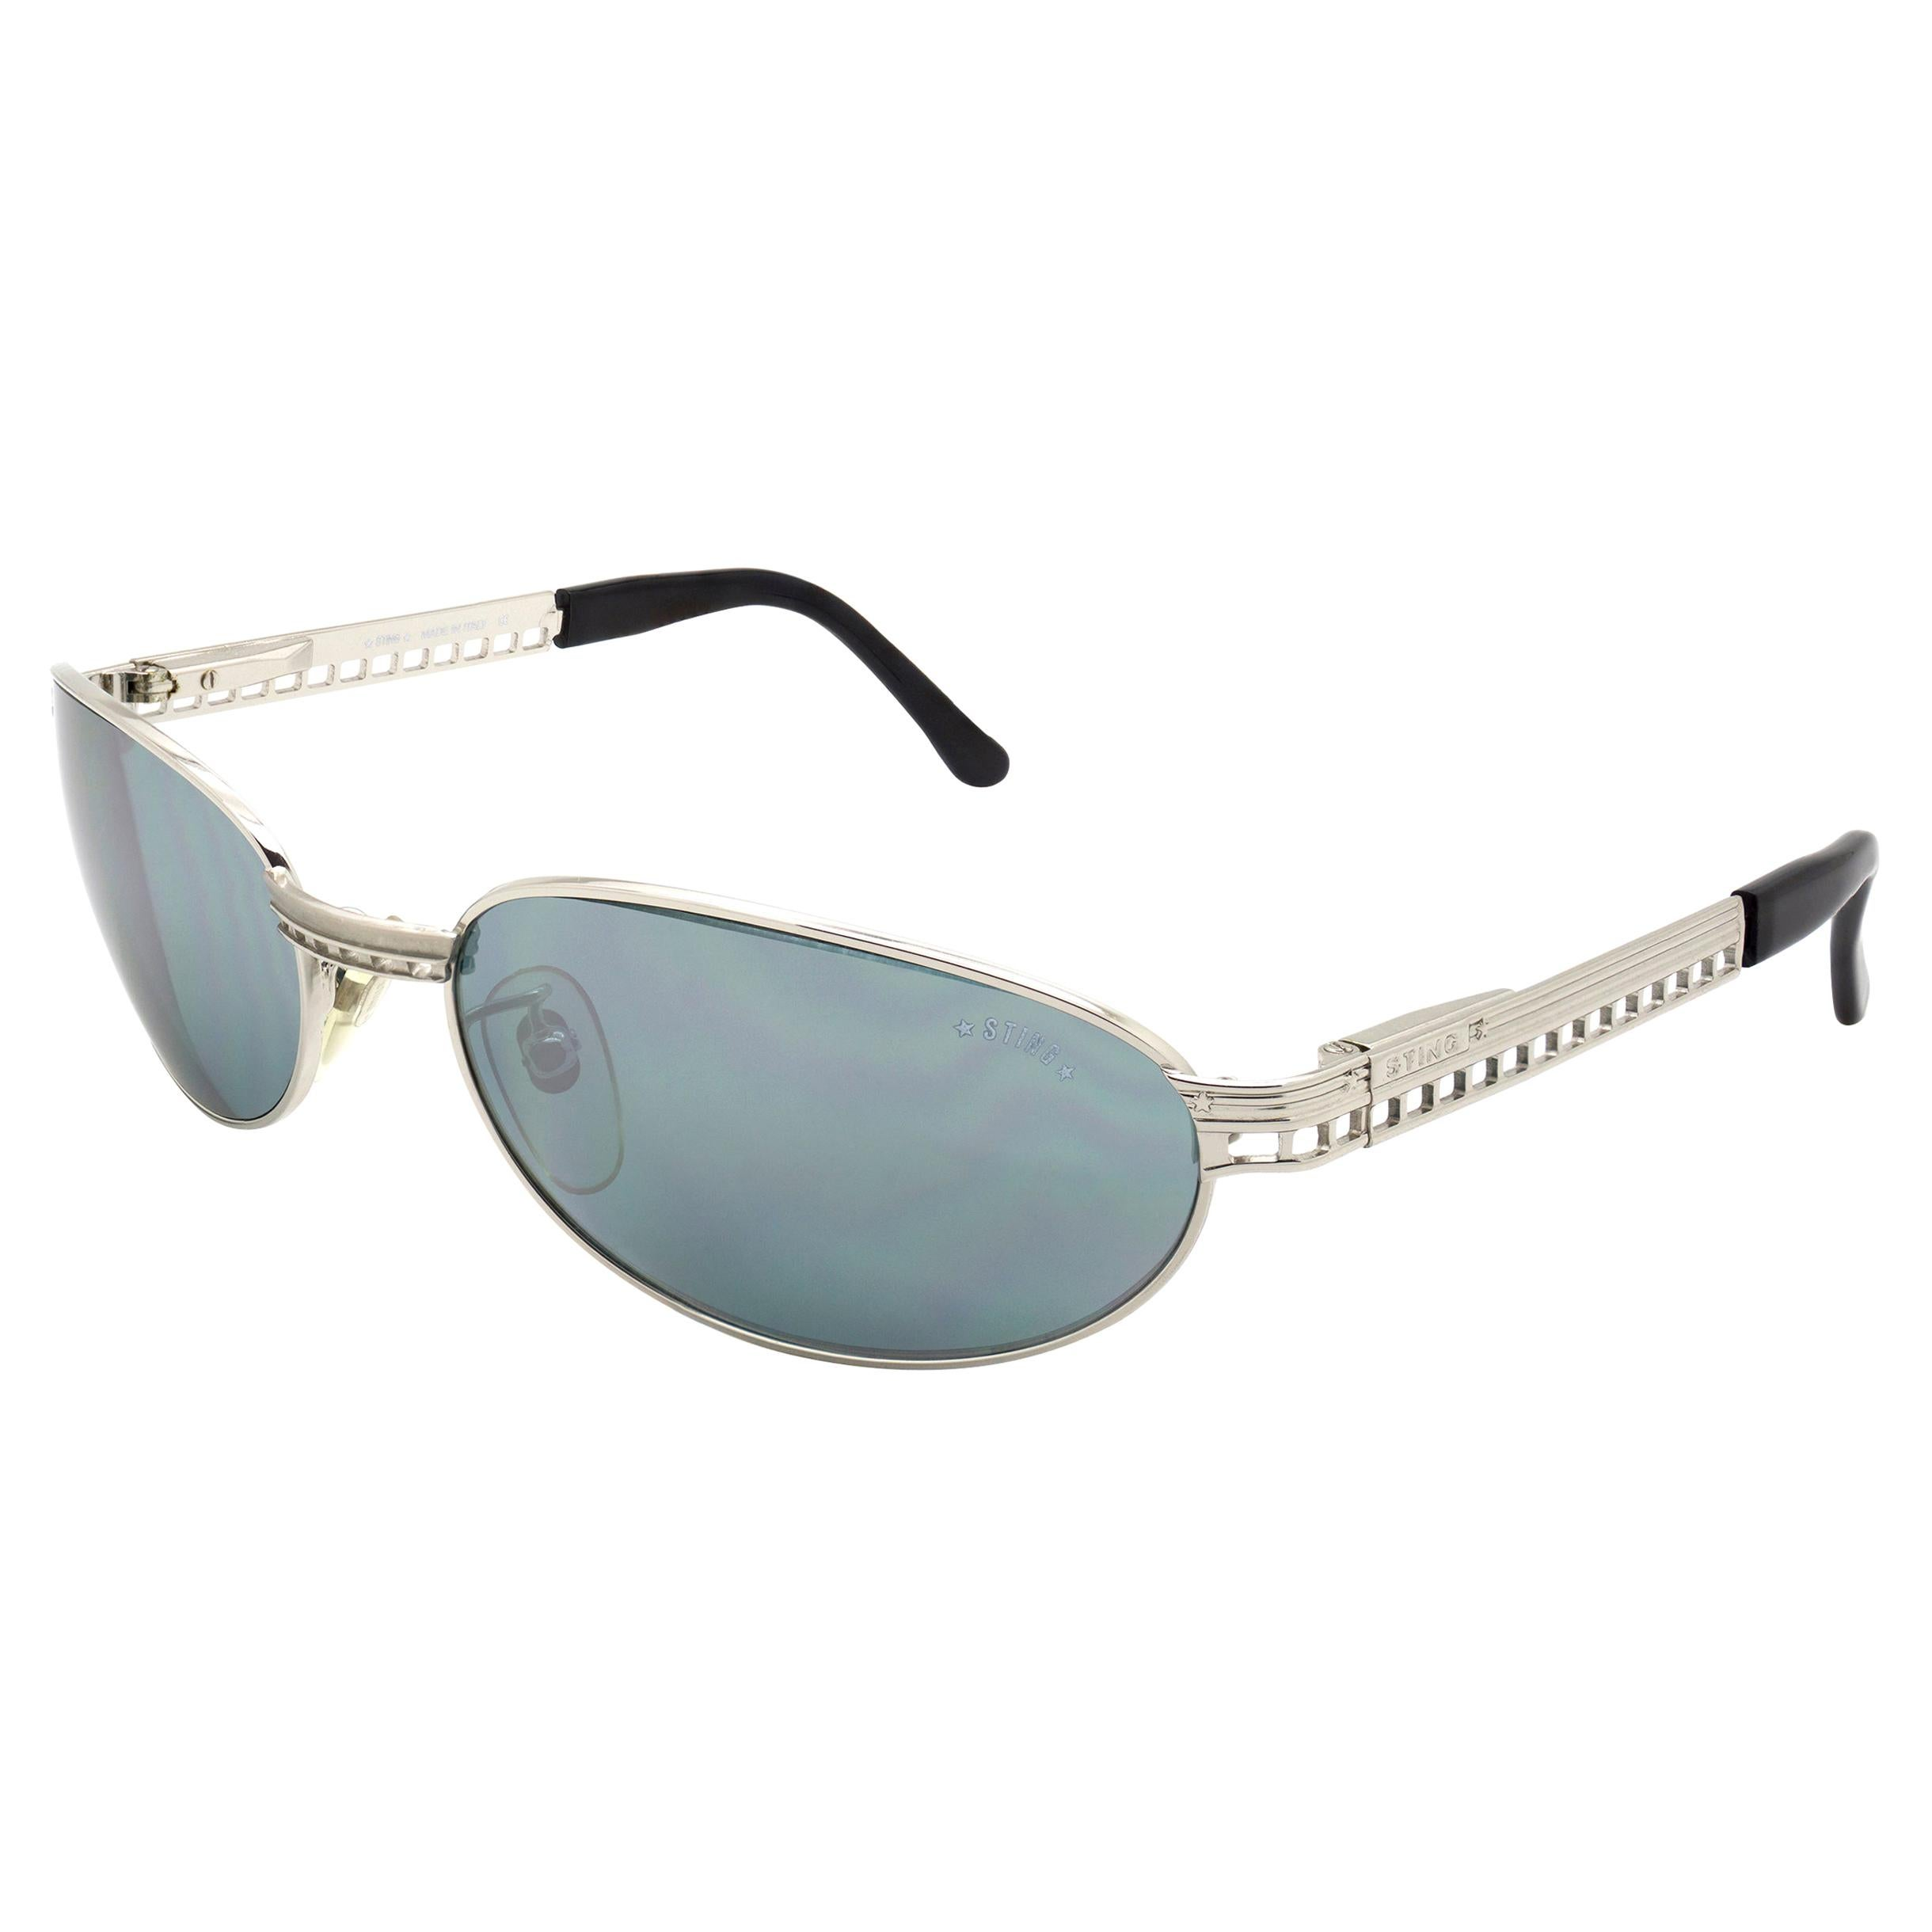 Sting mirror vintage sunglasses 90s